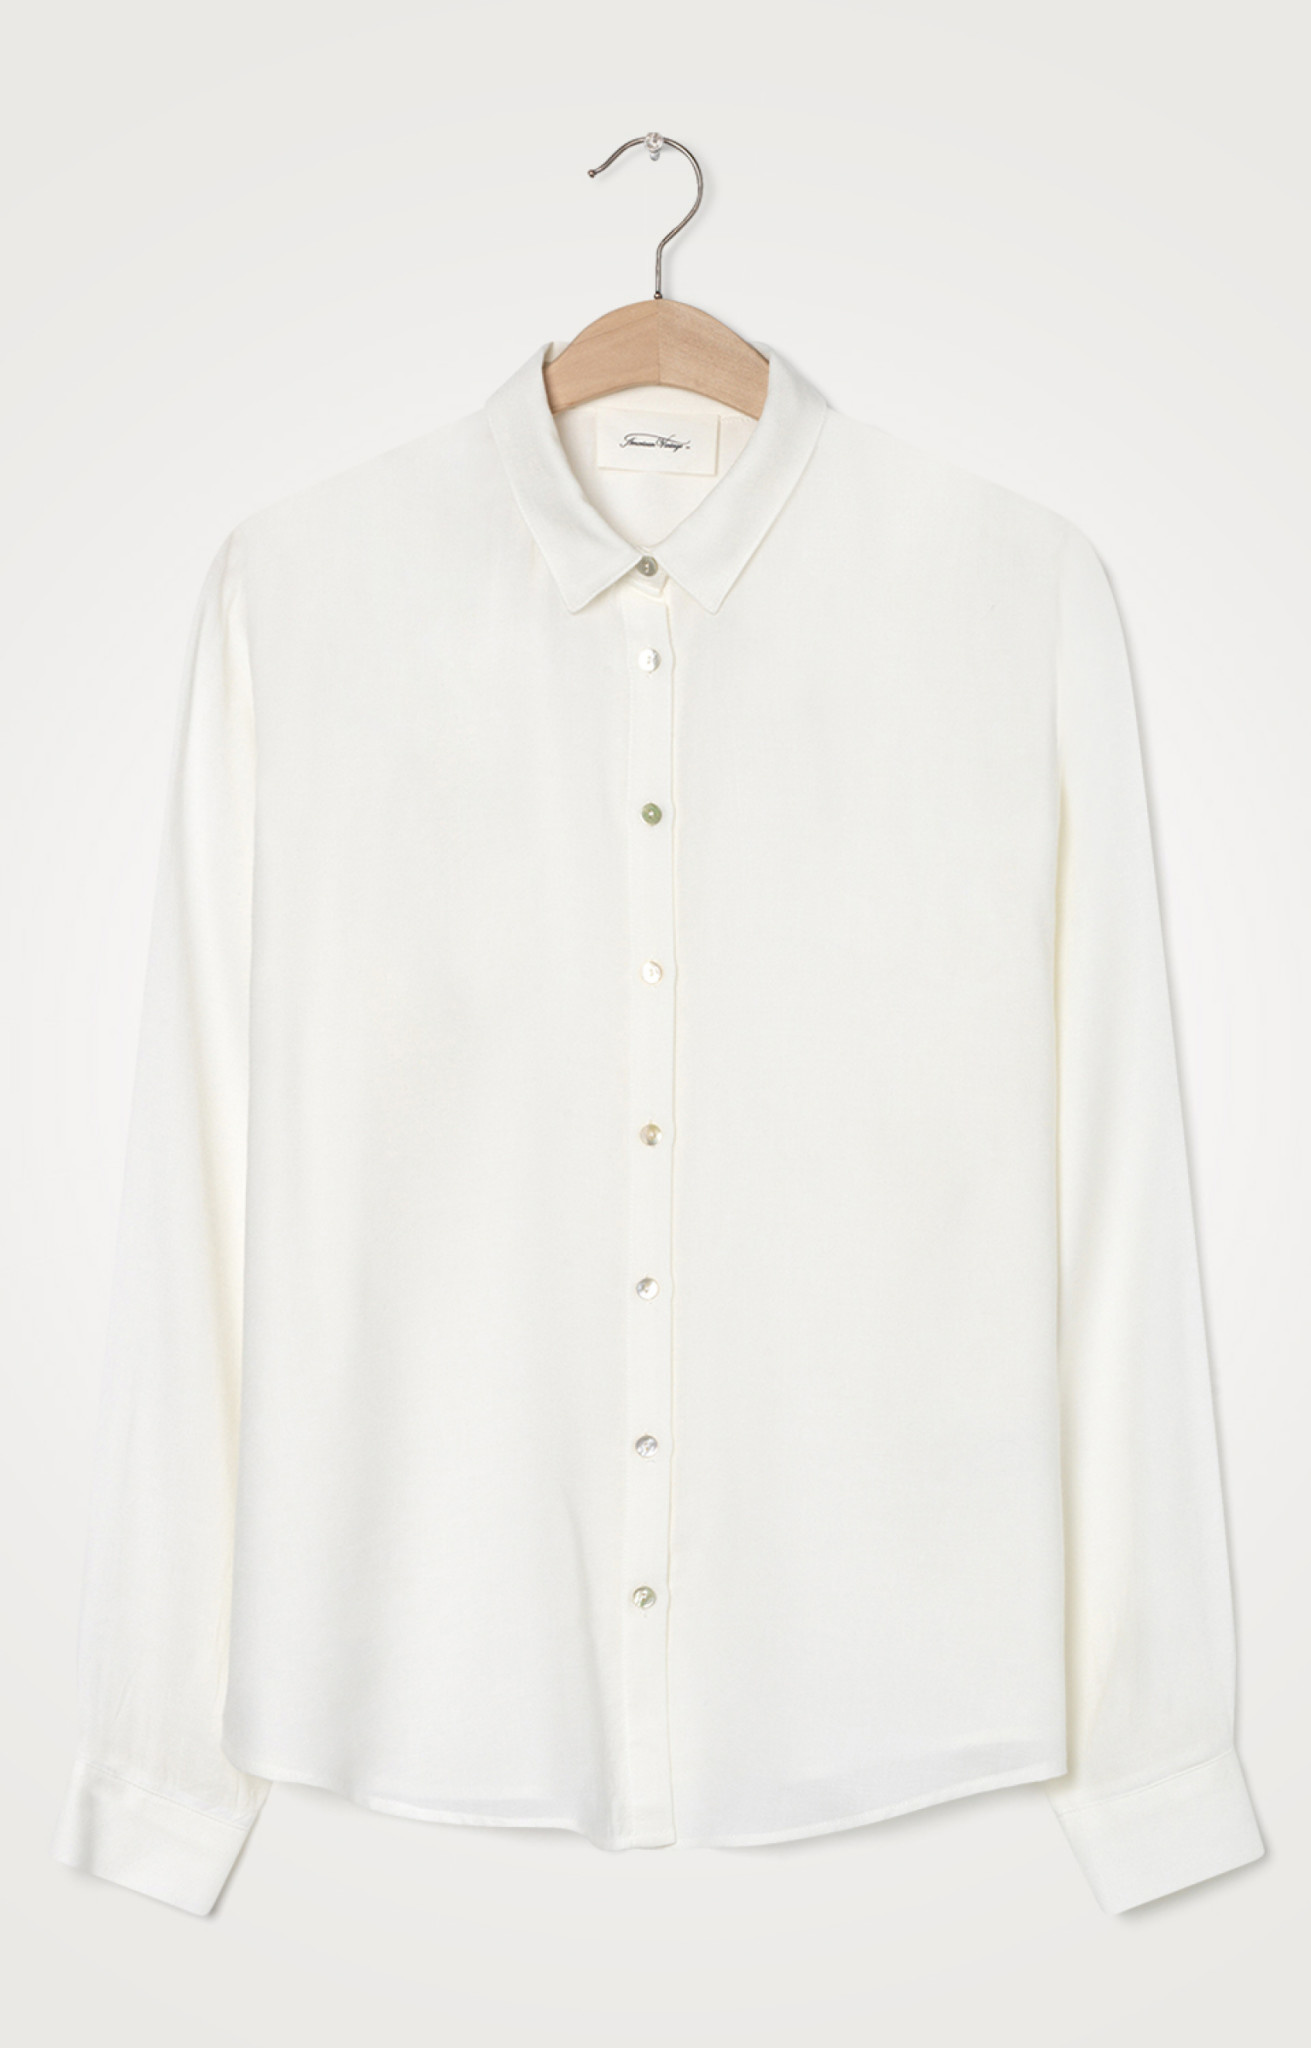 Dorabird Ecru White Shirt-1